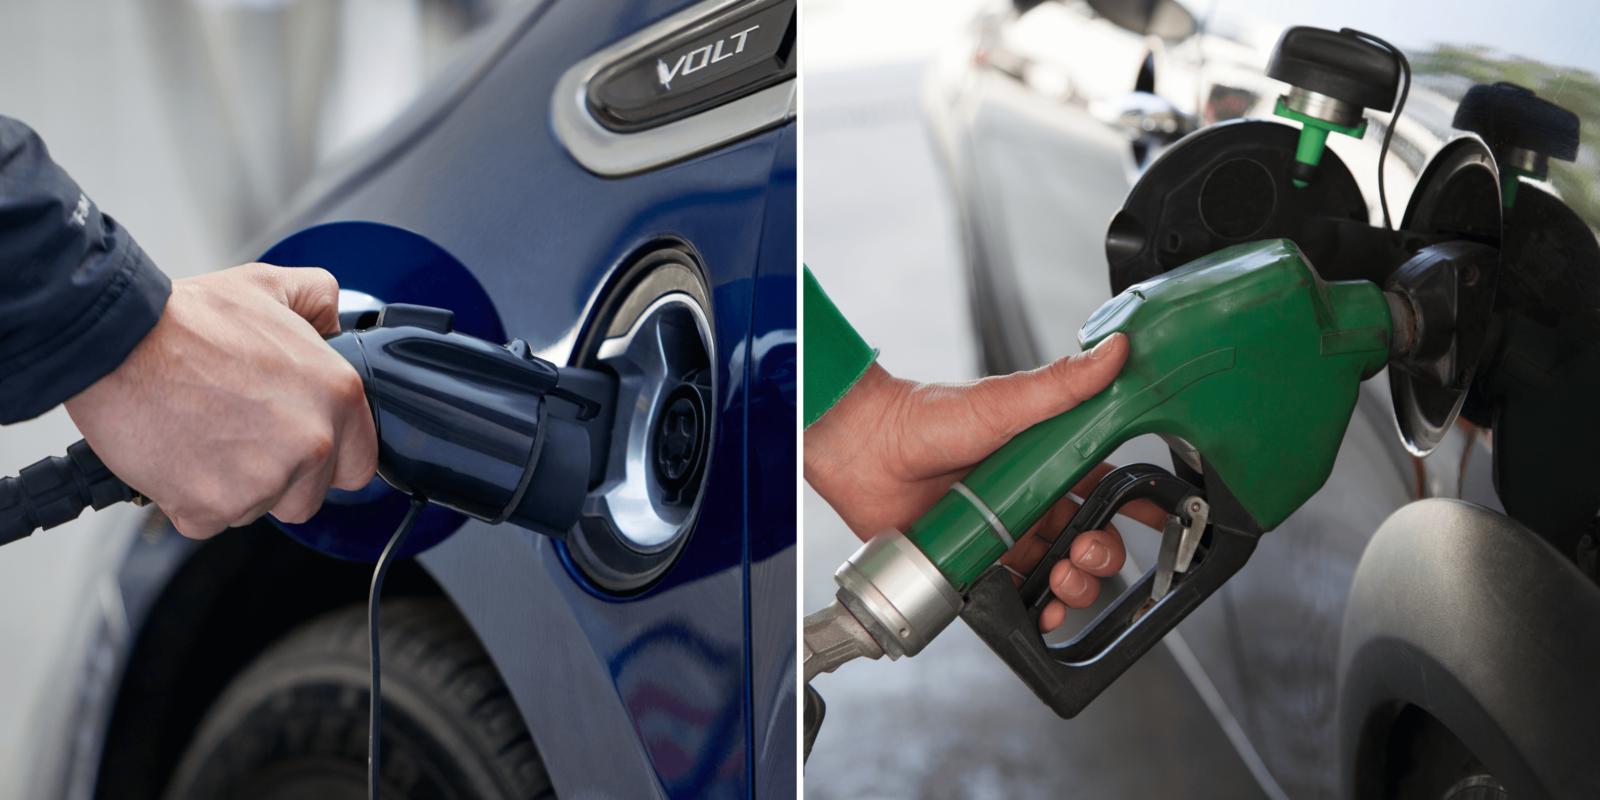 An electric charging plug versus a gas pump